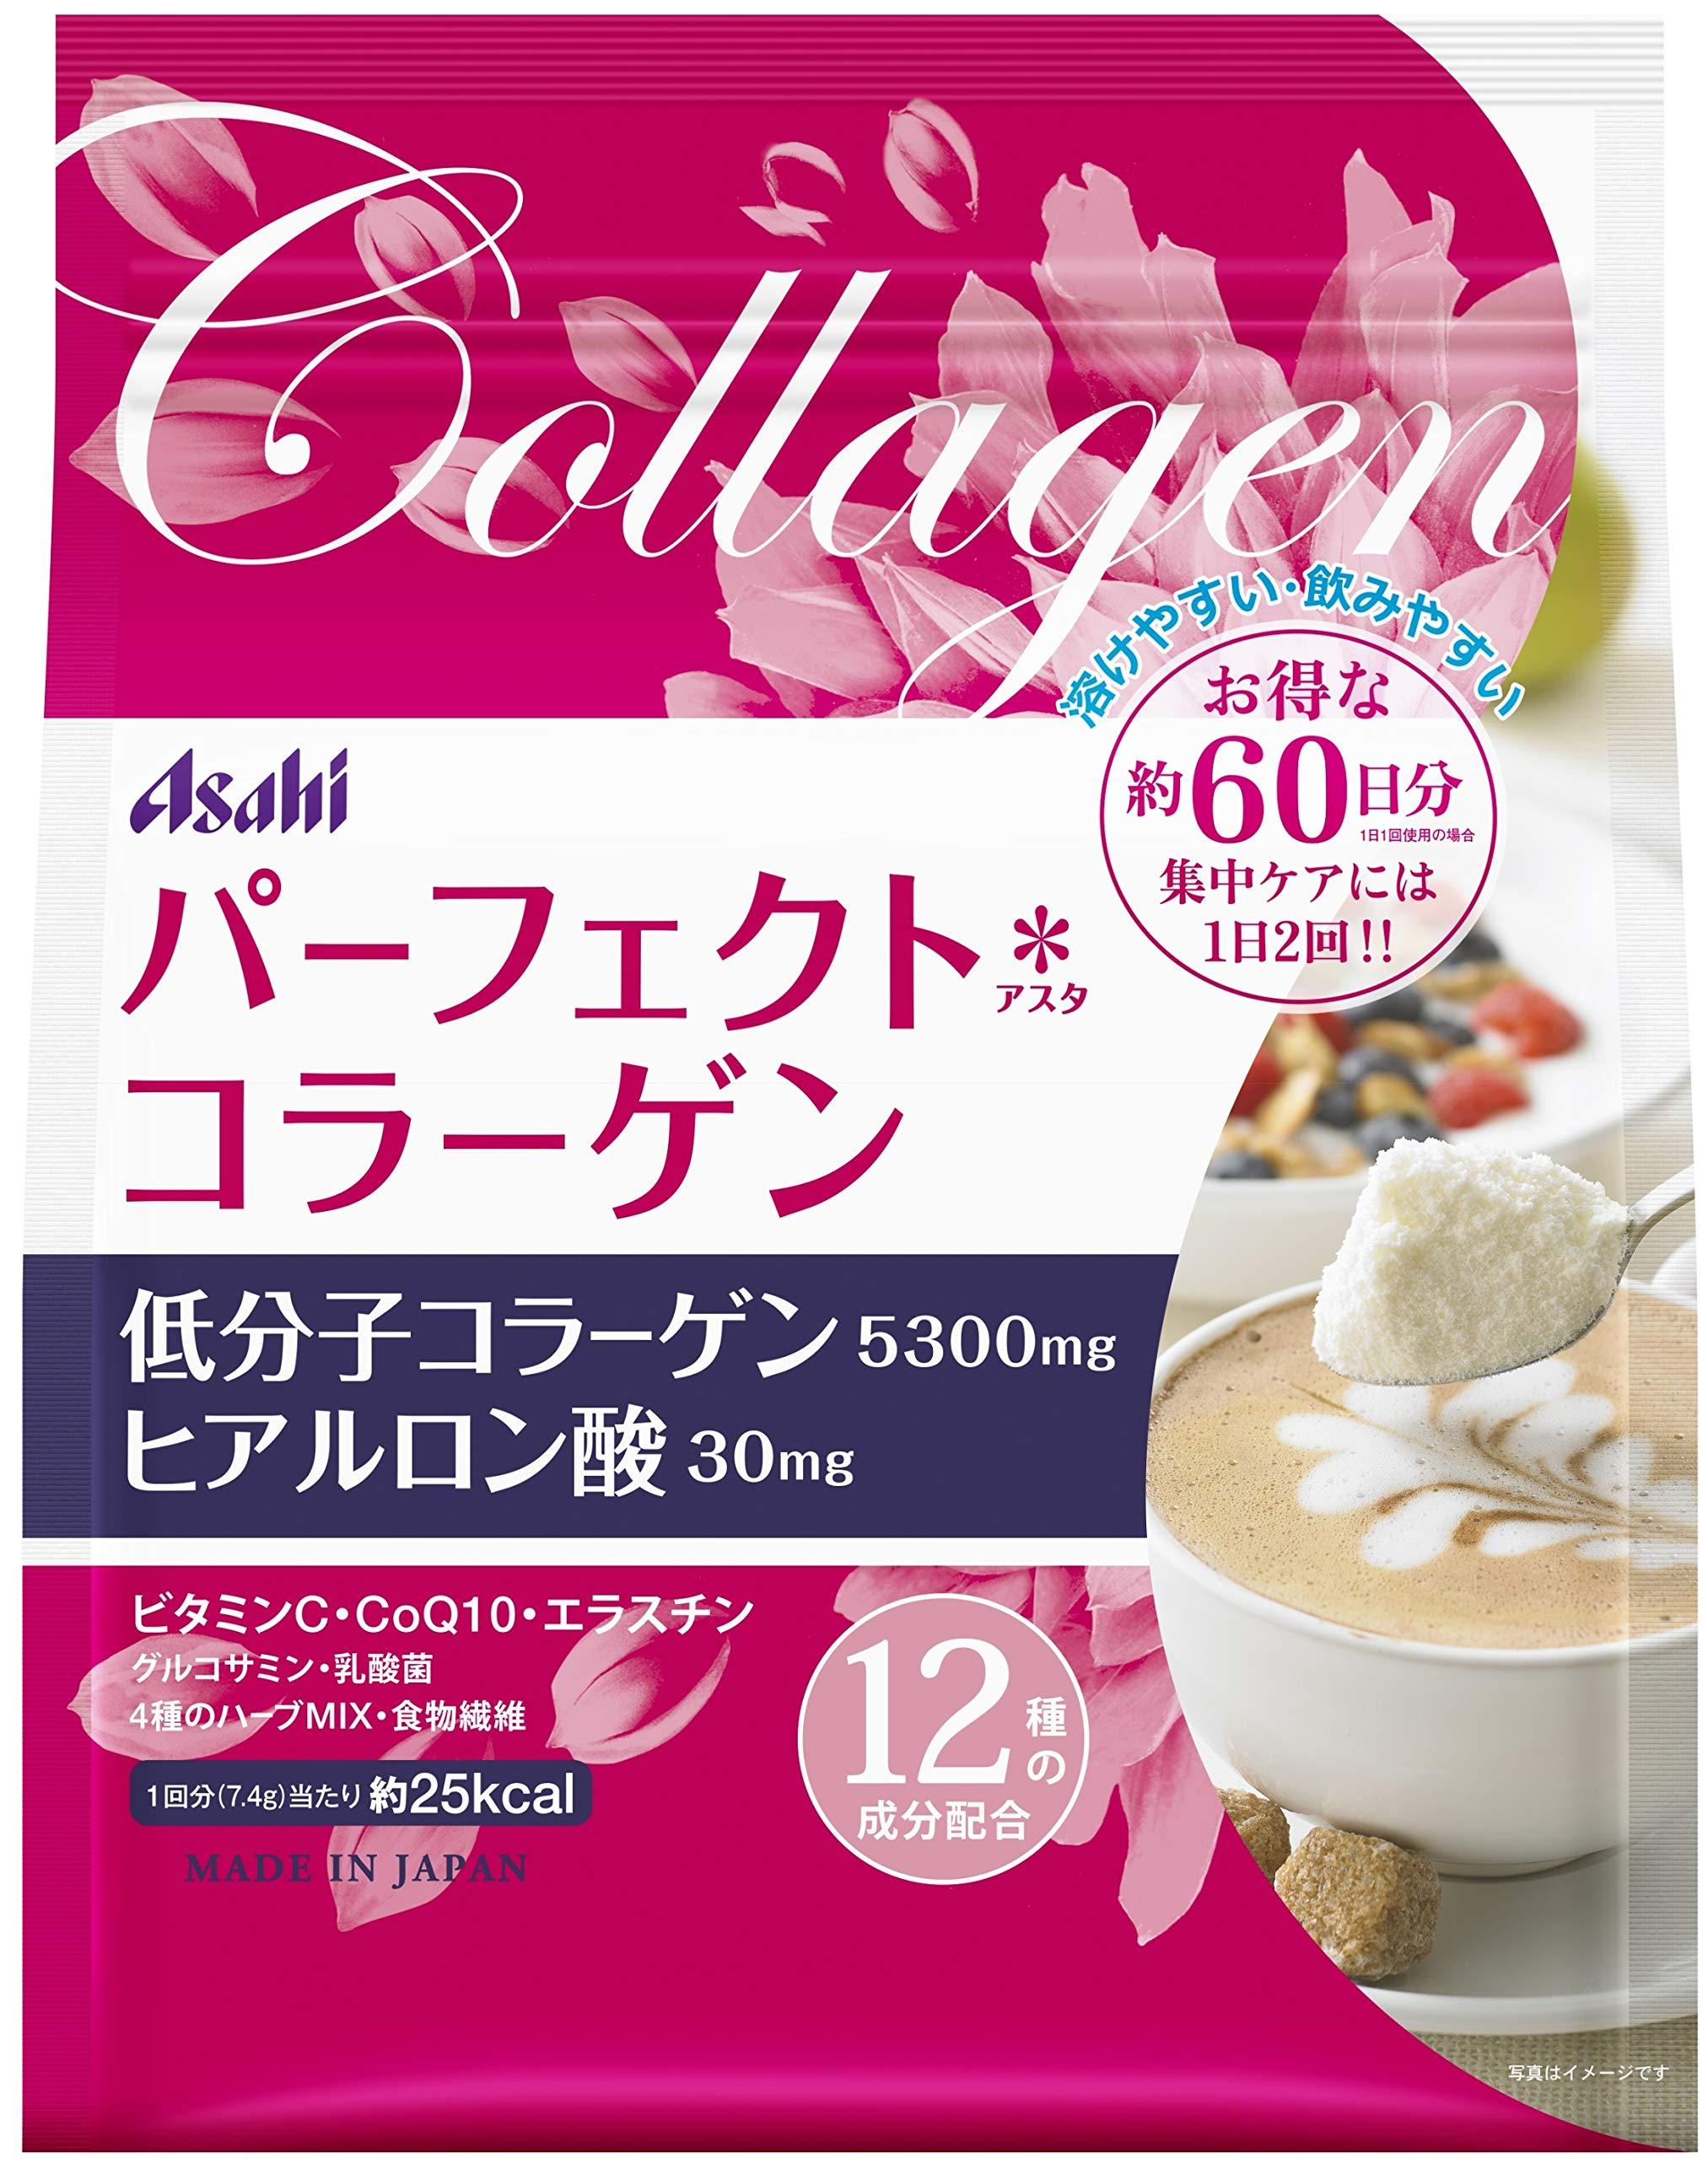 Asahi Perfect Collagen Powder 447g 60 Days